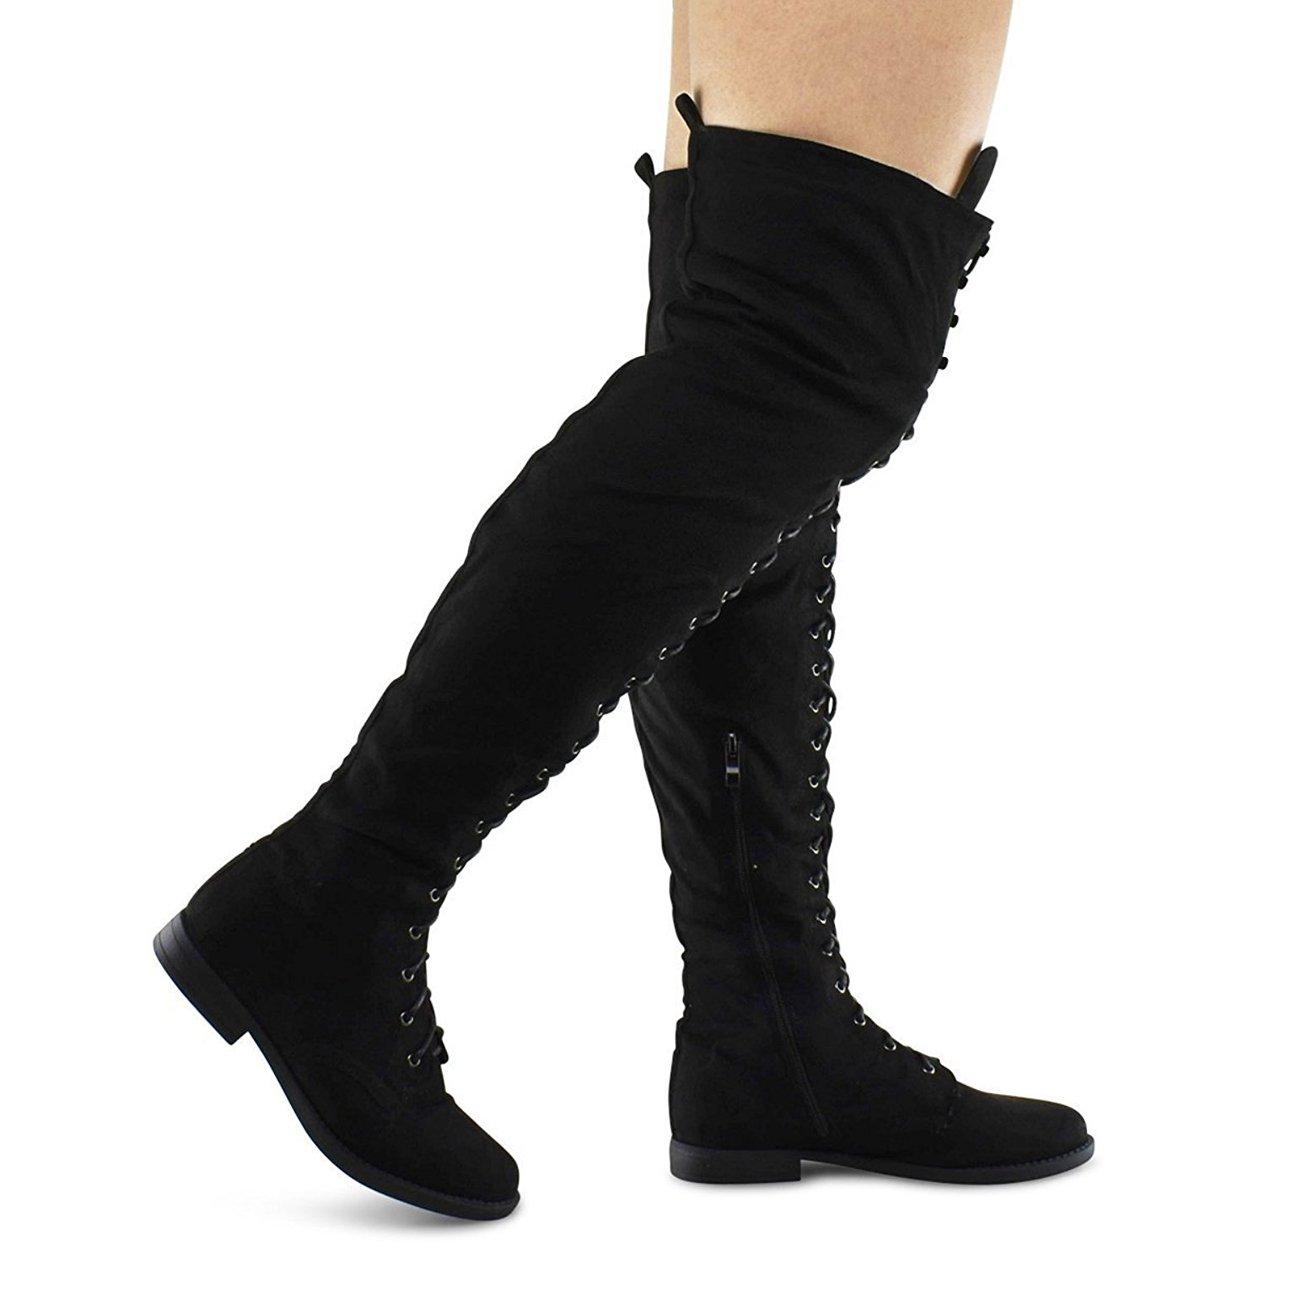 Premier Standard Women's Lace Thigh High Over The Knee Riding Boots - Side Zipper Comfy Vegan Suede B0758XN7NV 7 B(M) US|Black